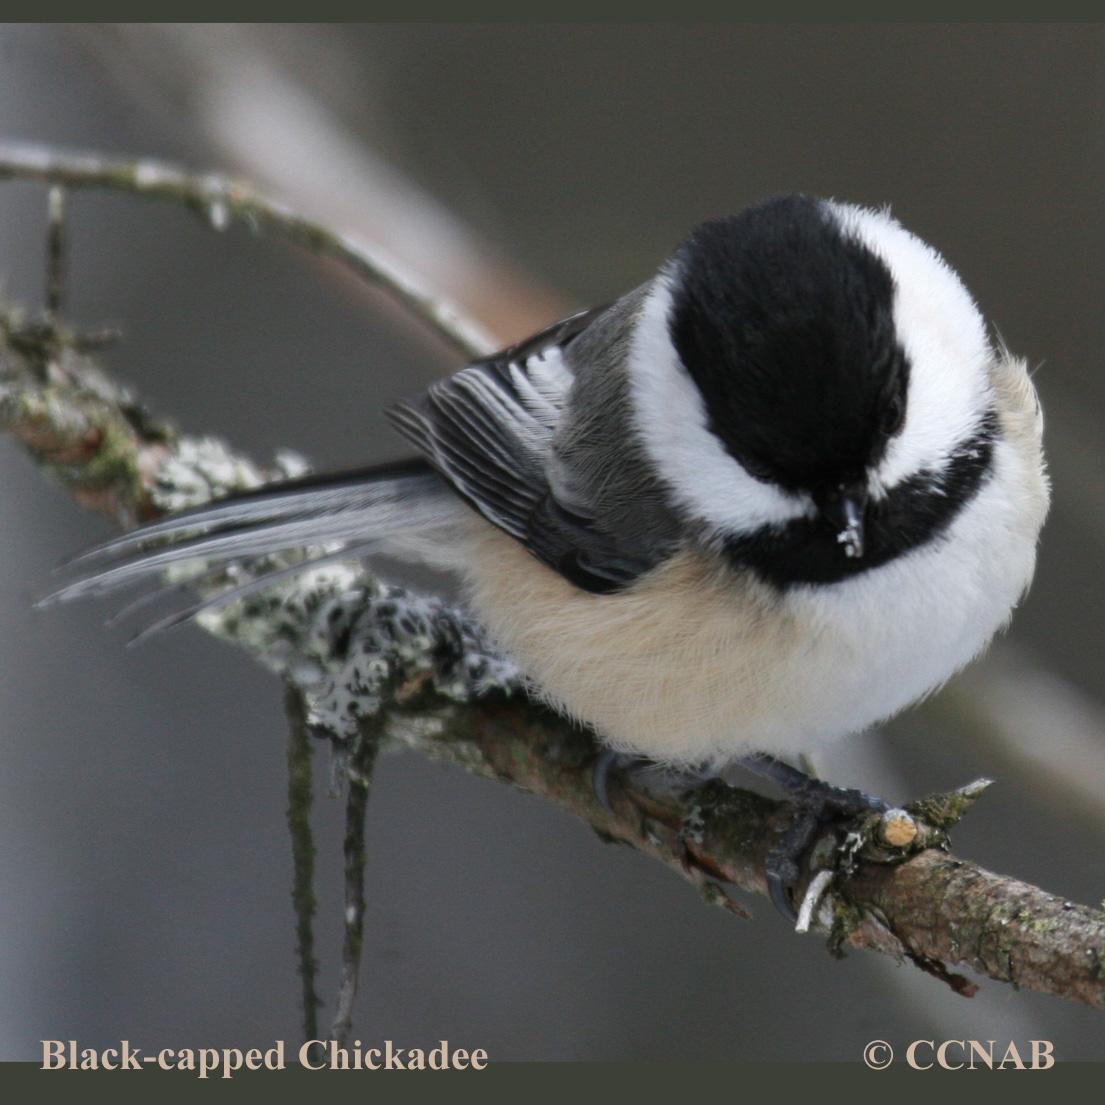 Blackcapped Chickadee North American Birds Birds of North America